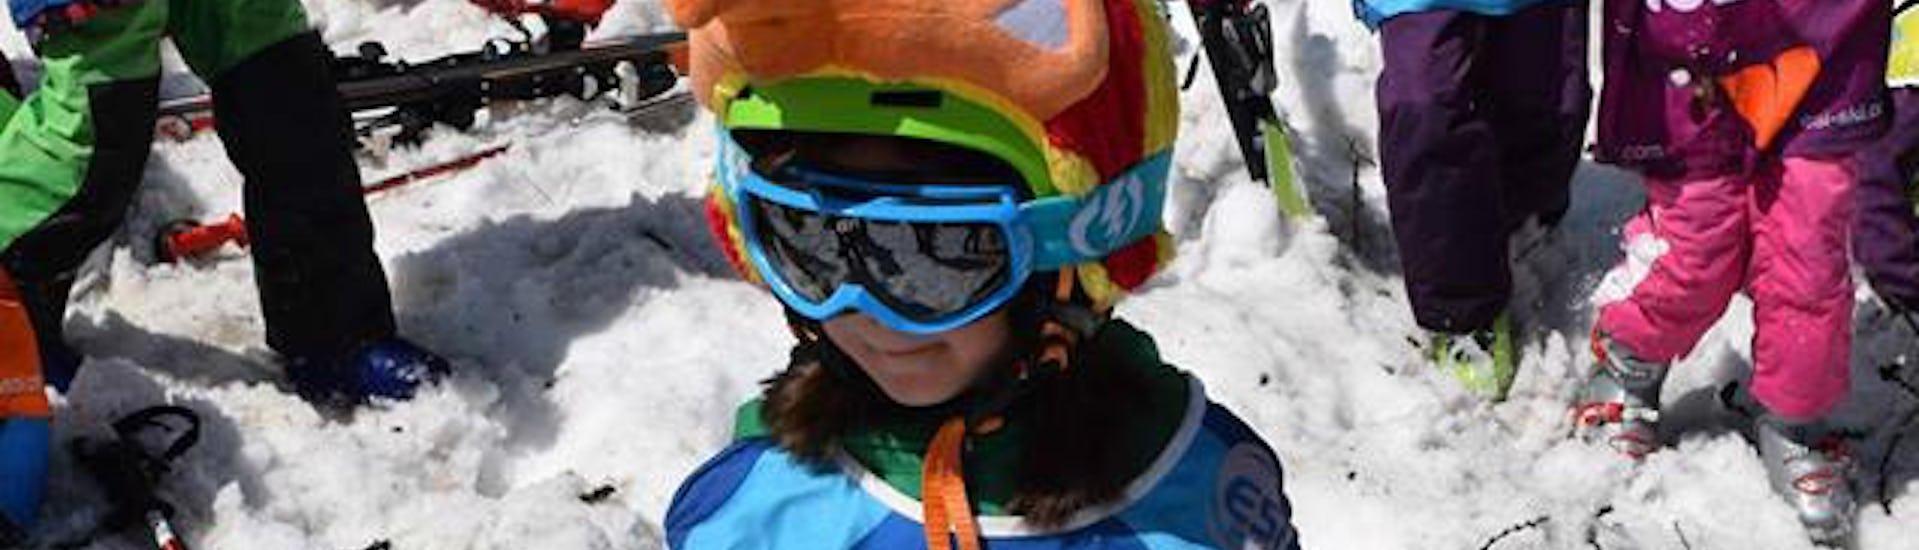 Ski Instructor Private Kids (5-12 y.) - High season